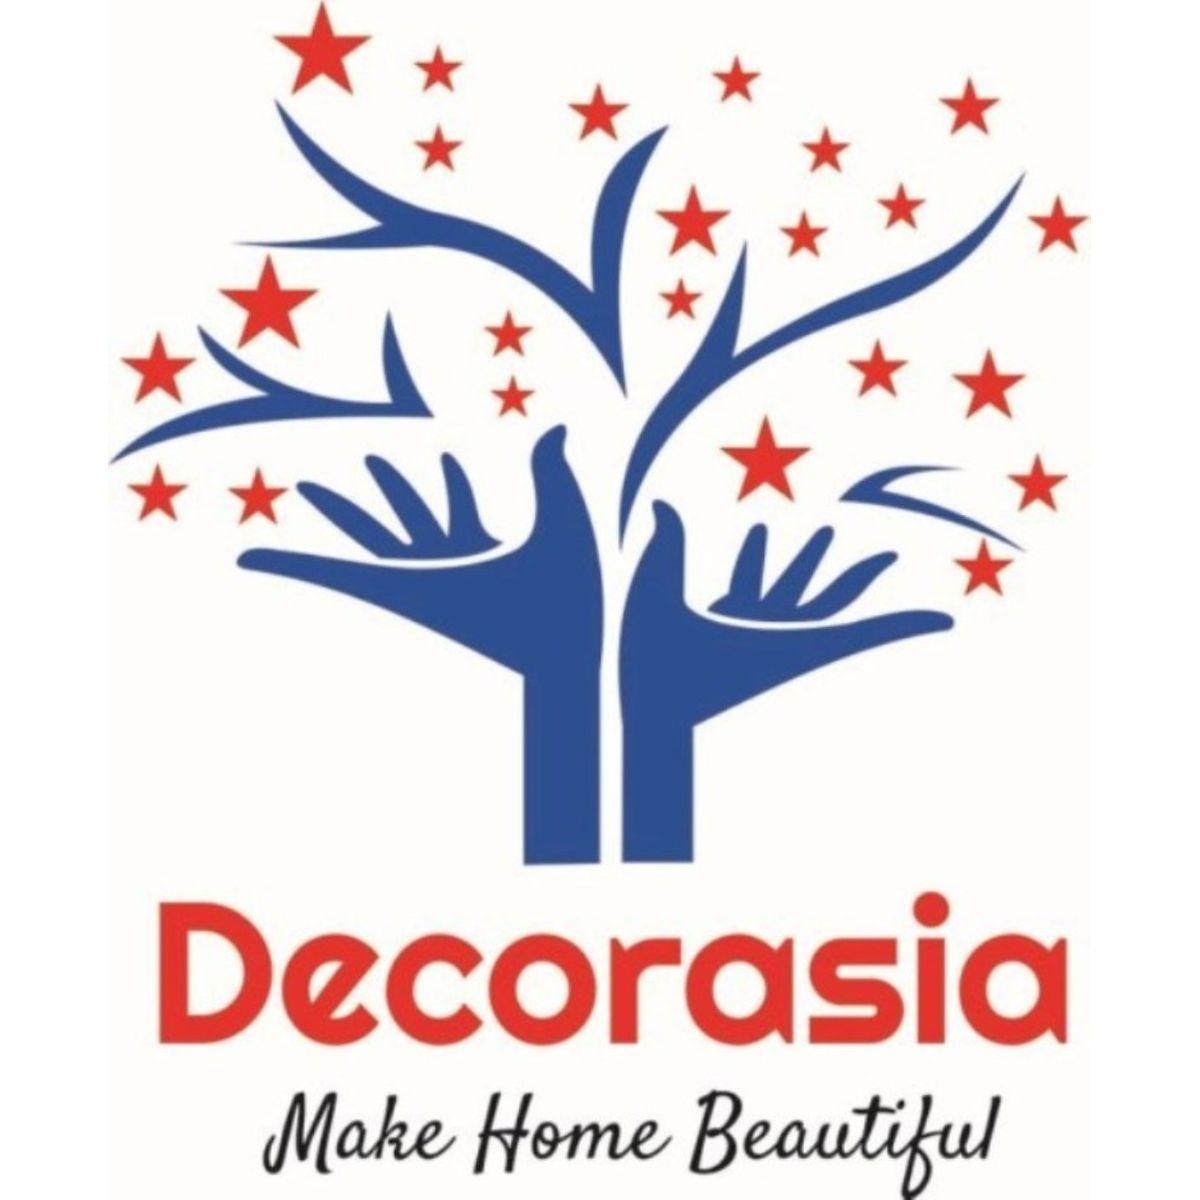 Decorasia Beautiful Design Wooden Wall Shelf Size - 23 x 6 x 11 Inch